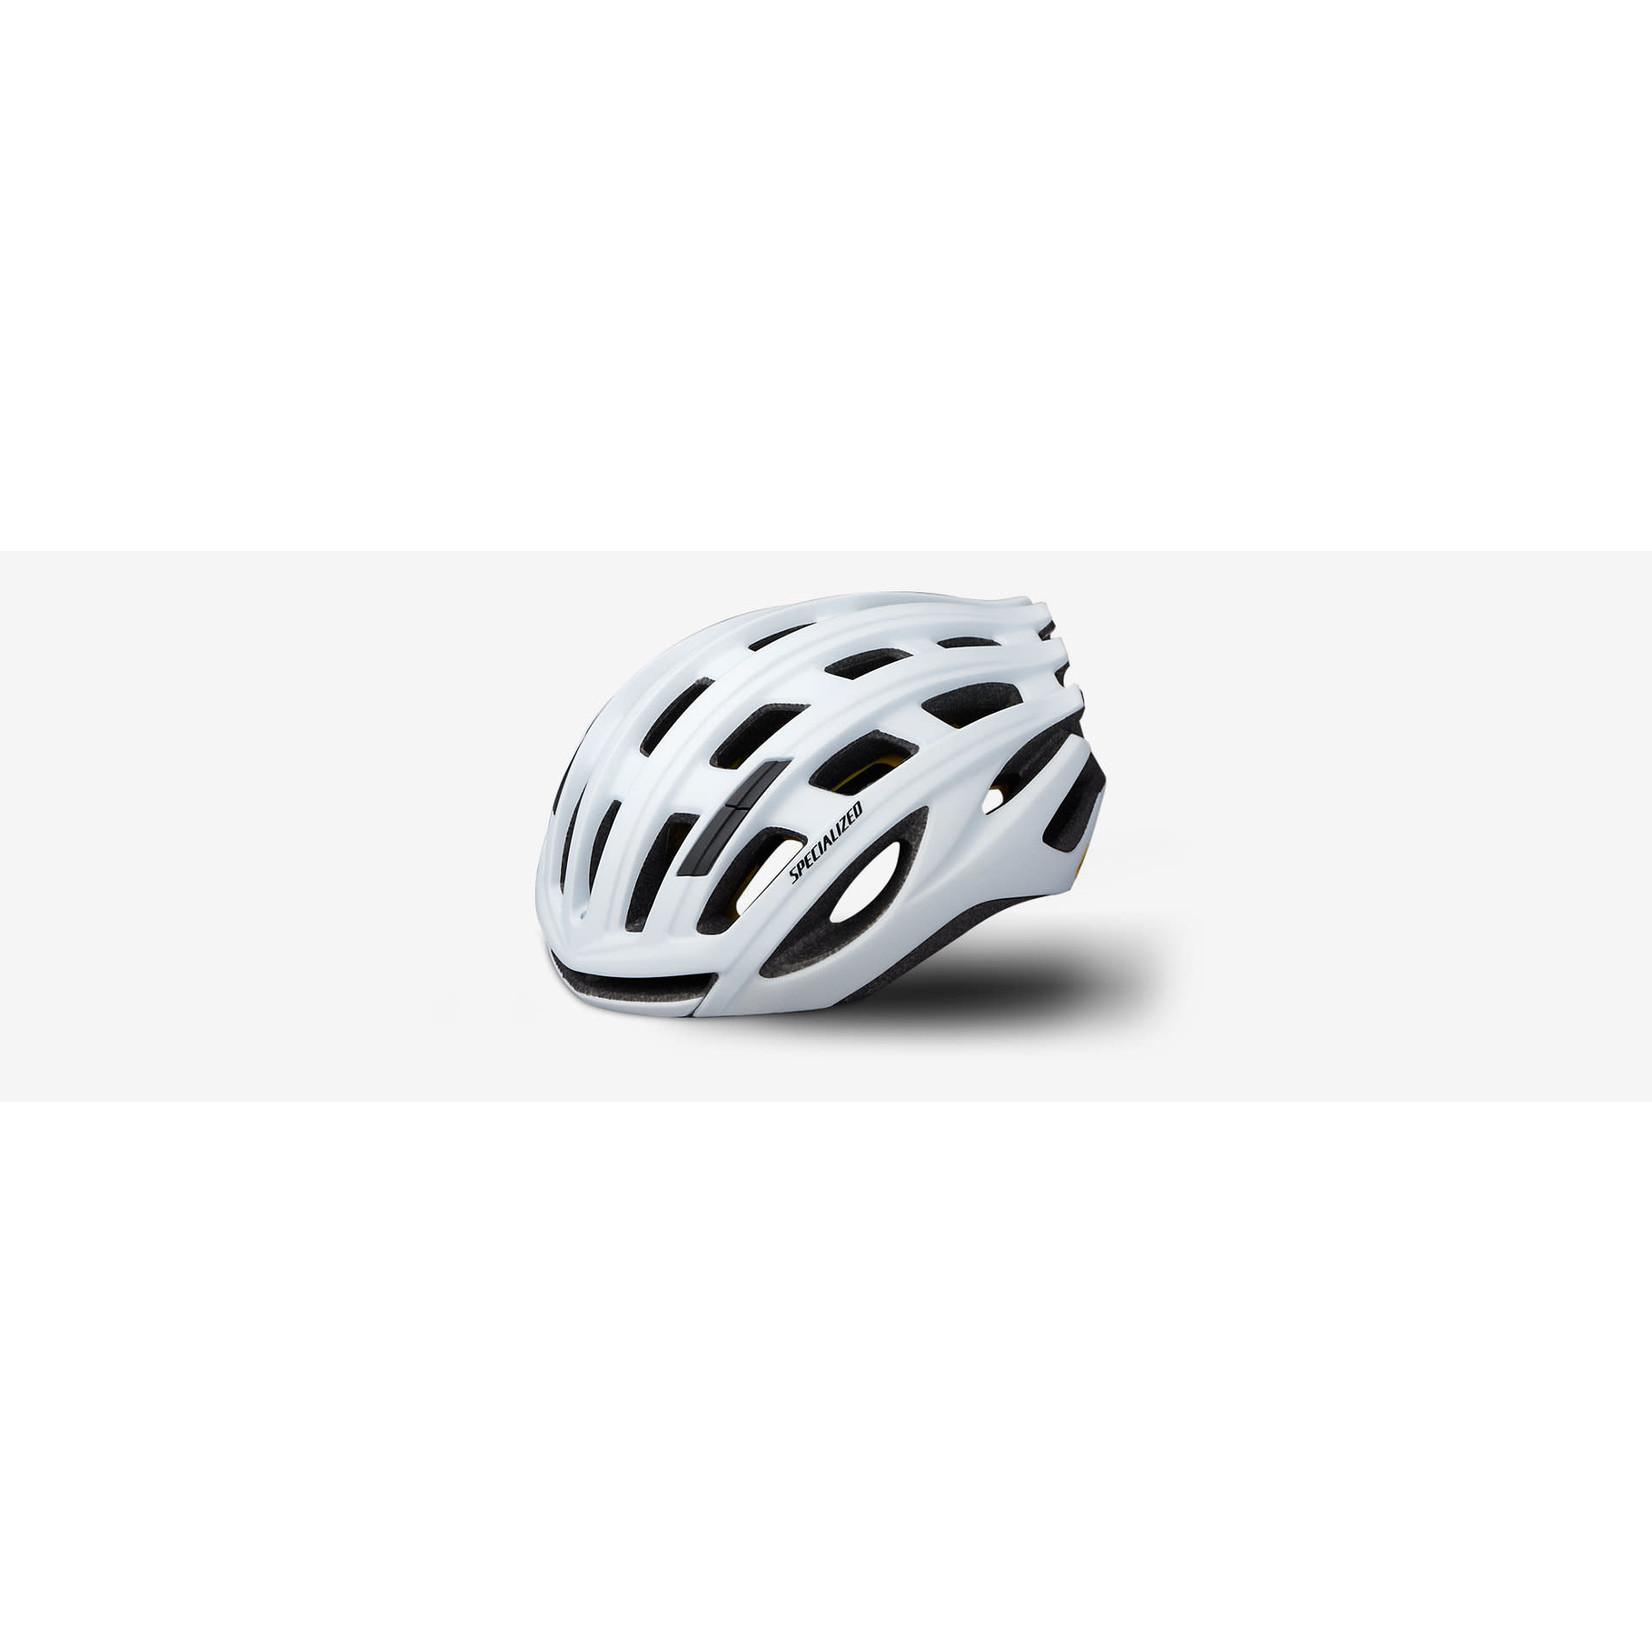 Specialized Specialized Propero 3 Helmet, White, S